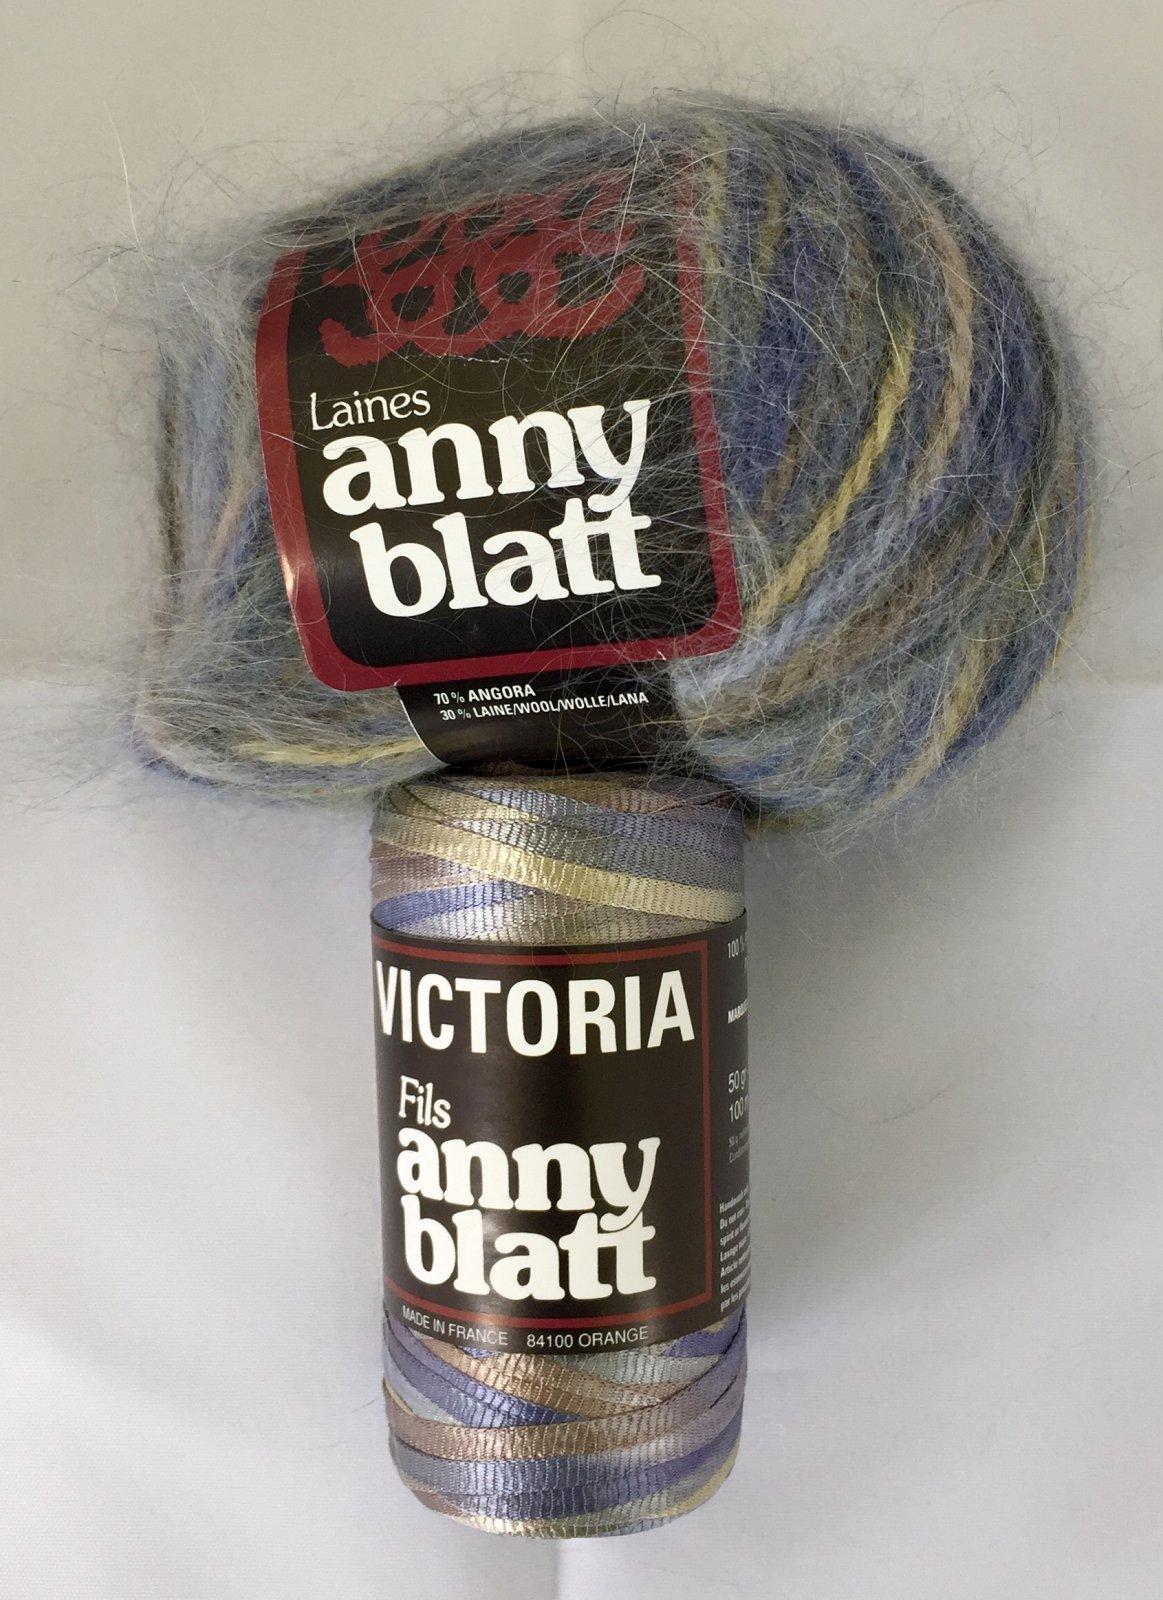 Anny Blatt: Victoria Scarf Kit